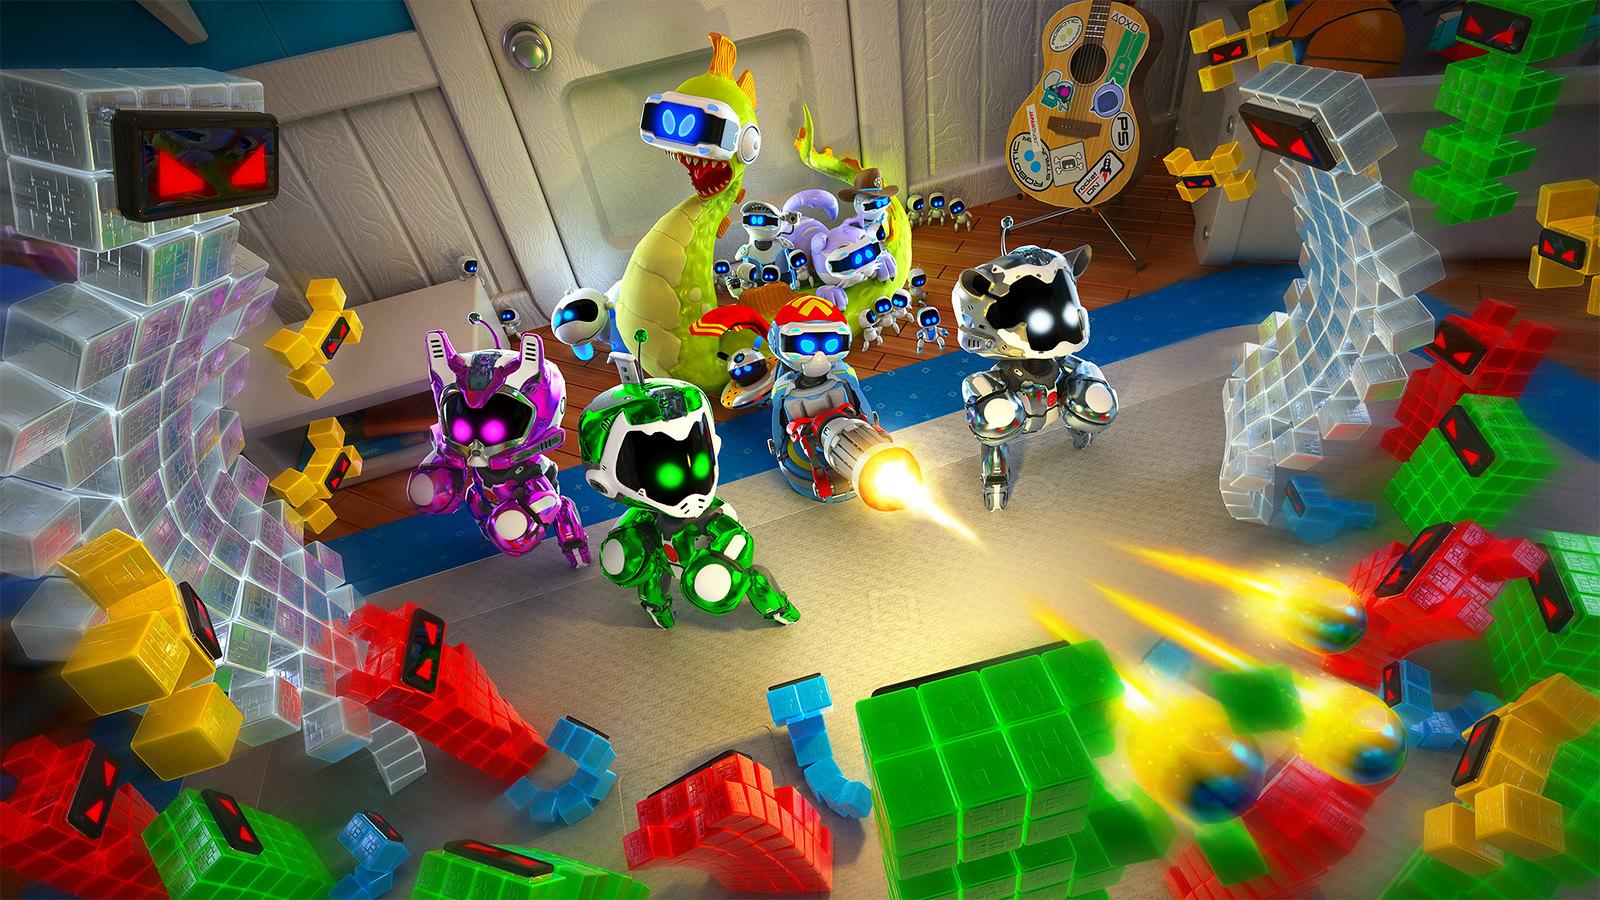 Playroom VR